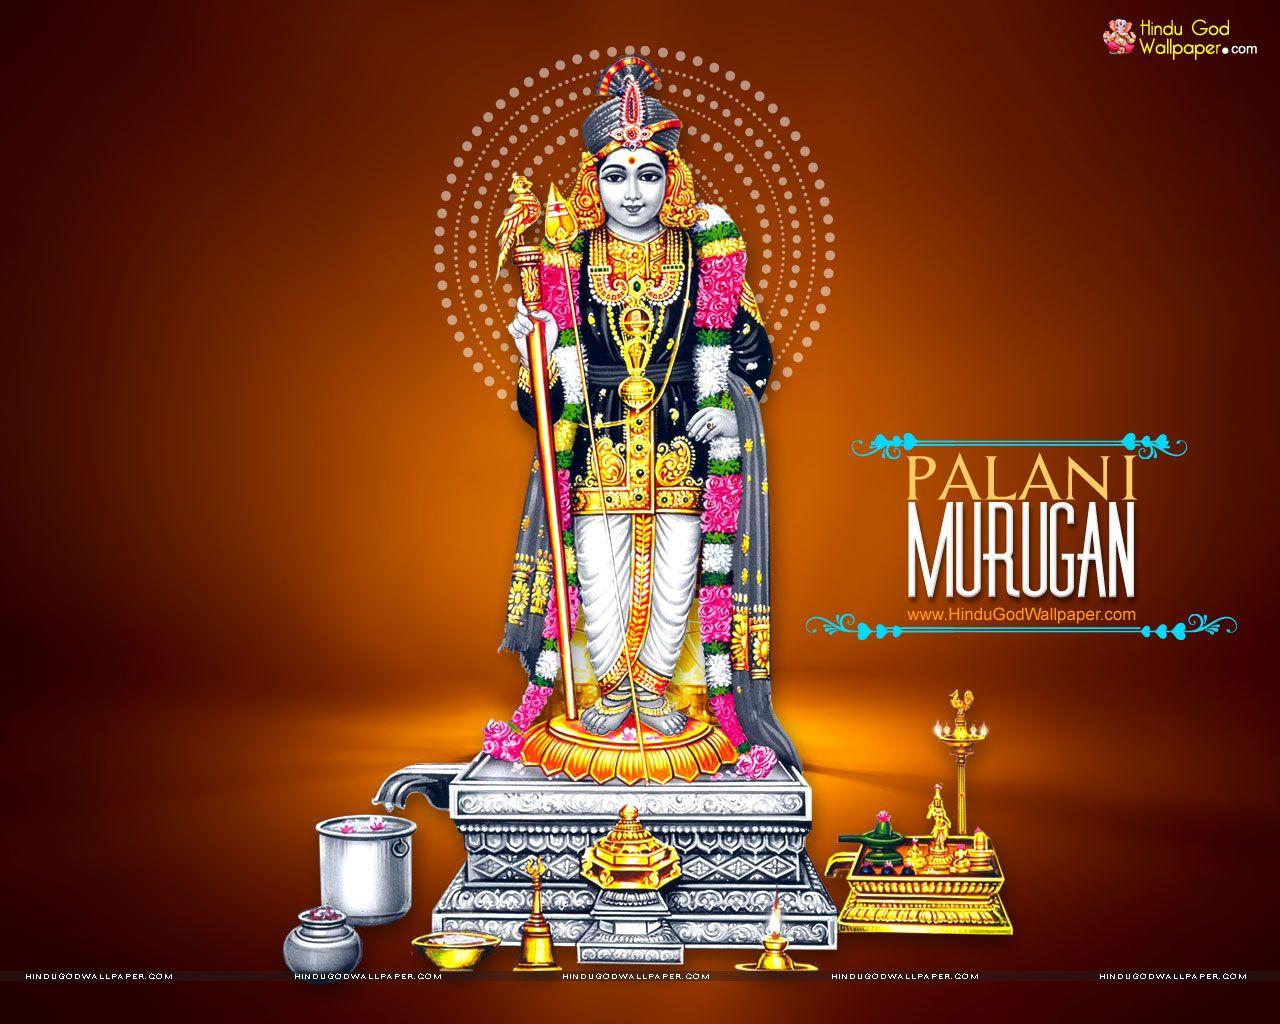 Palani Murugan Wallpapers Photos Free Download Lord Murugan Wallpapers Lord Murugan Lord Shiva Hd Wallpaper